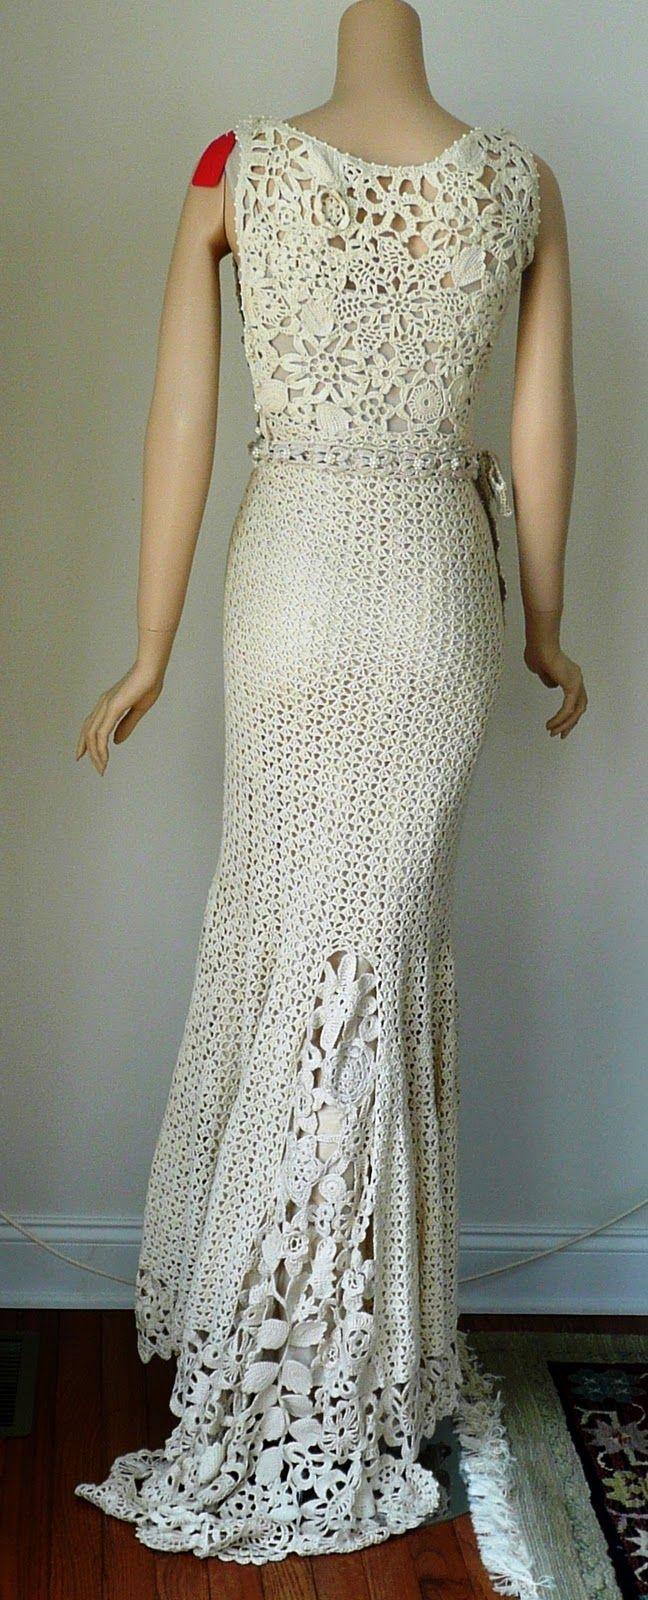 Crochet Pattern Wedding Dress Crochet Guild Of America 2010 Design